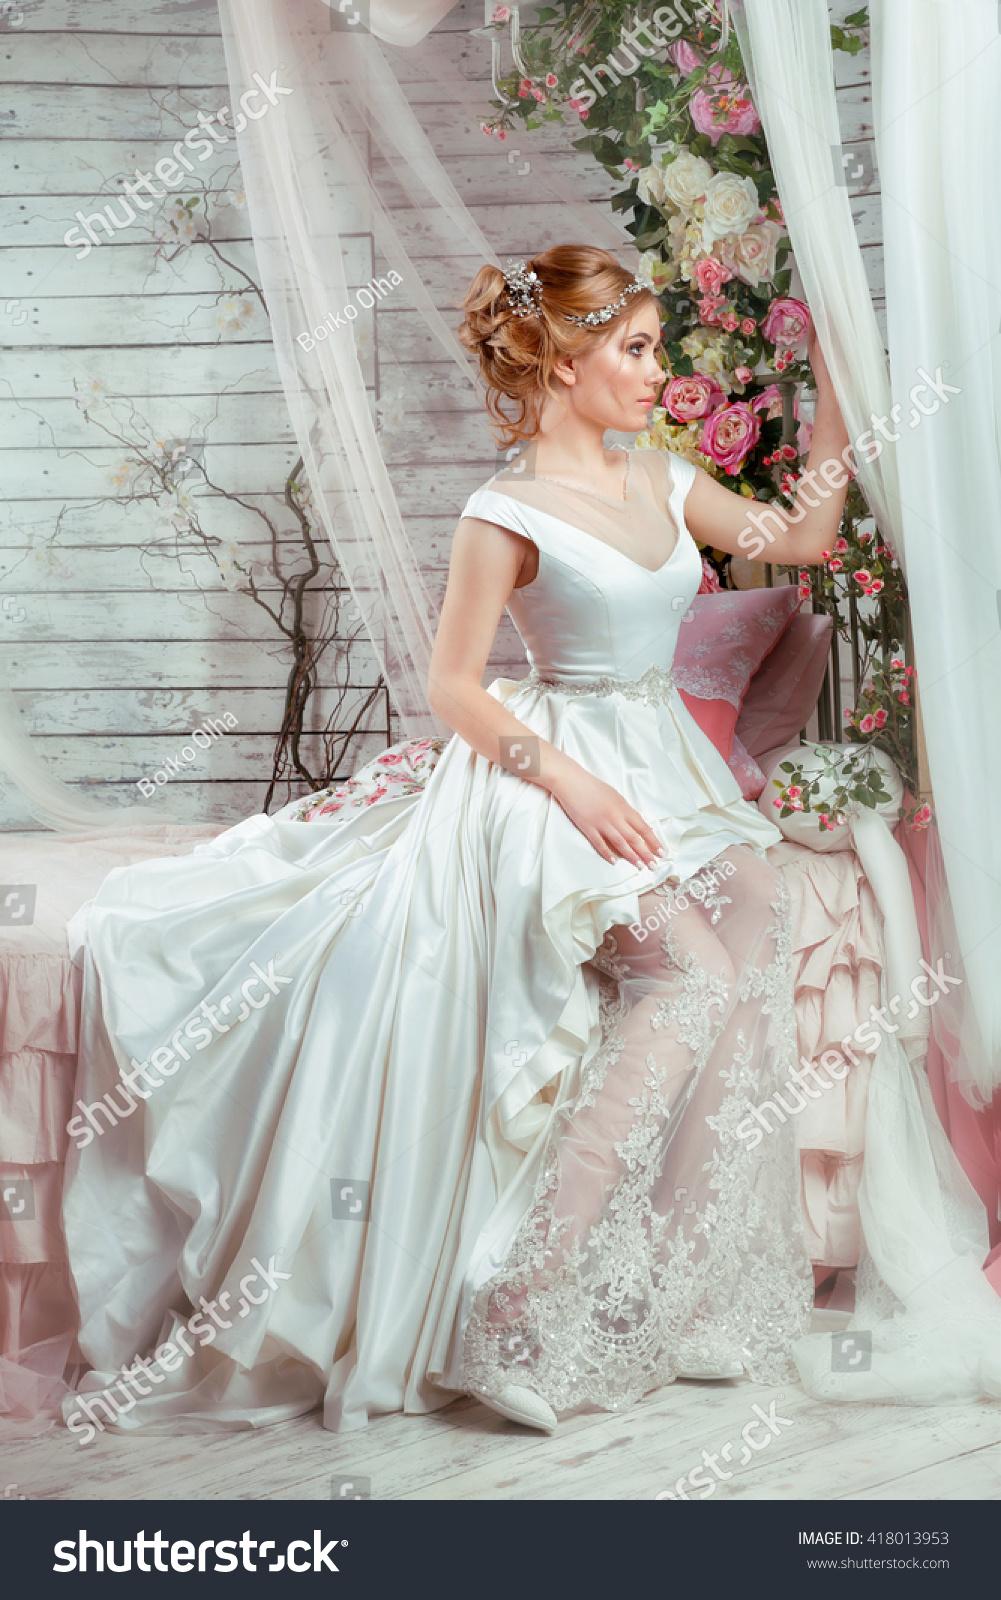 Romantic Young Woman Wedding Dress Sitting Stock Photo (Royalty Free ...